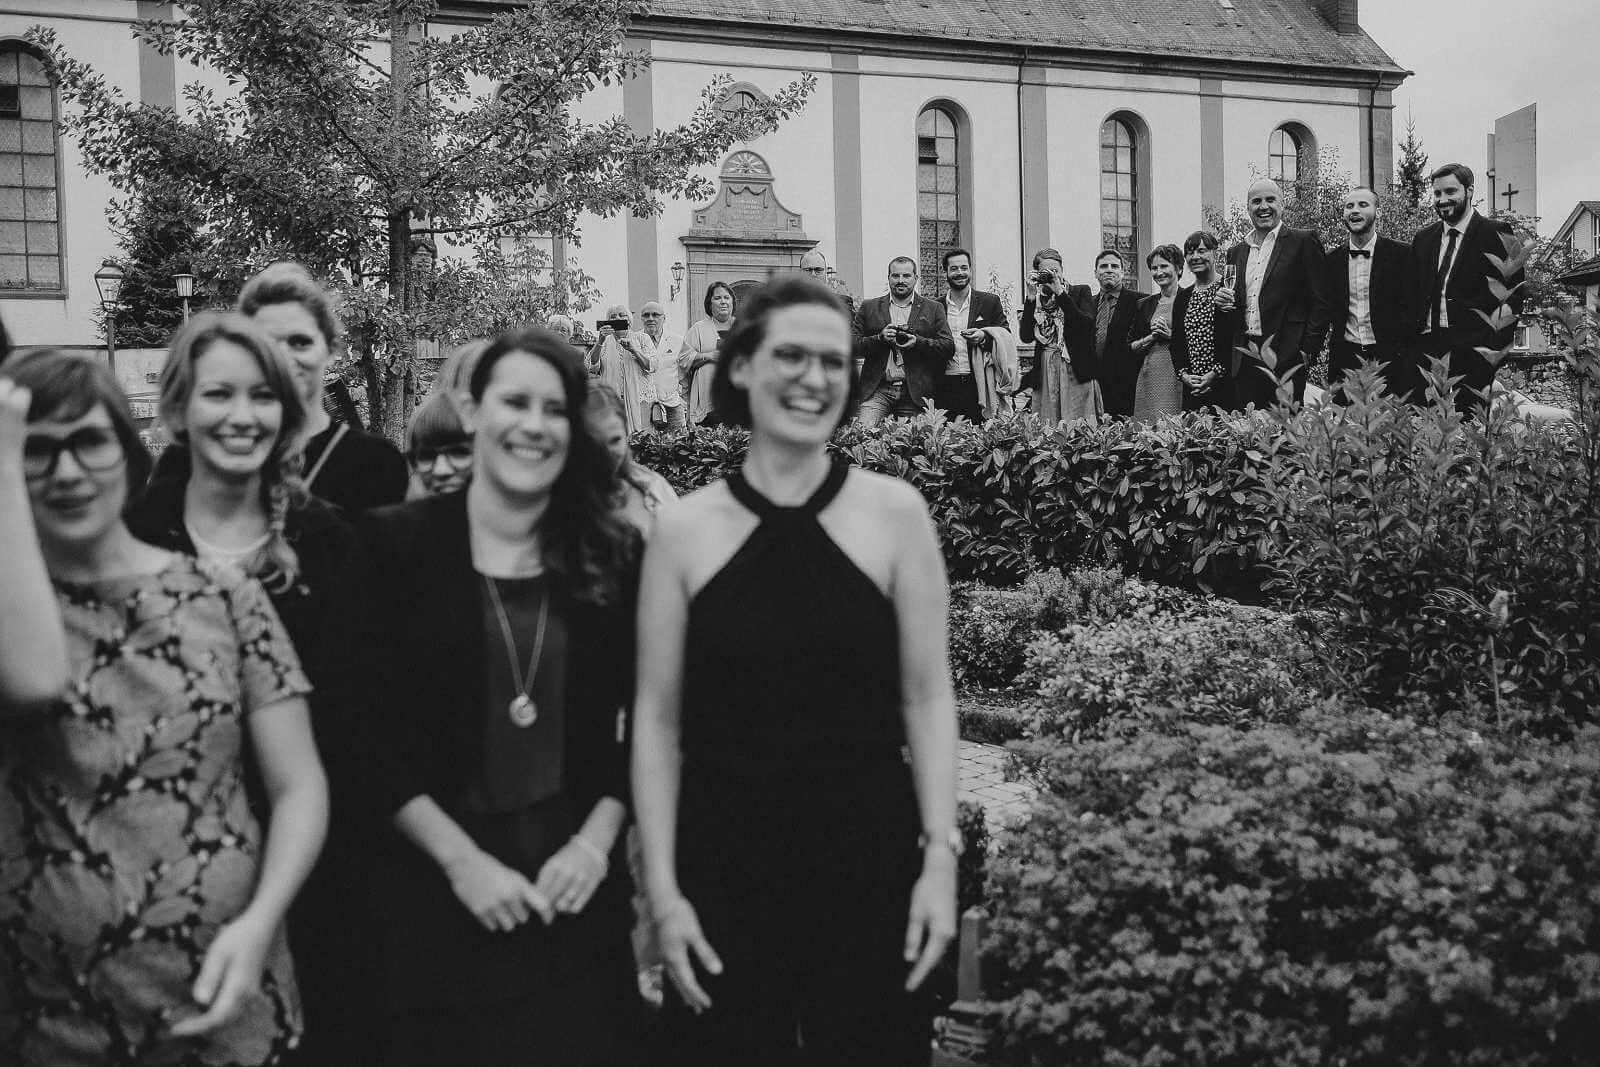 Hochzeitsfotograf Offenburg Zell am Harmersbach Bärenkeller (54)